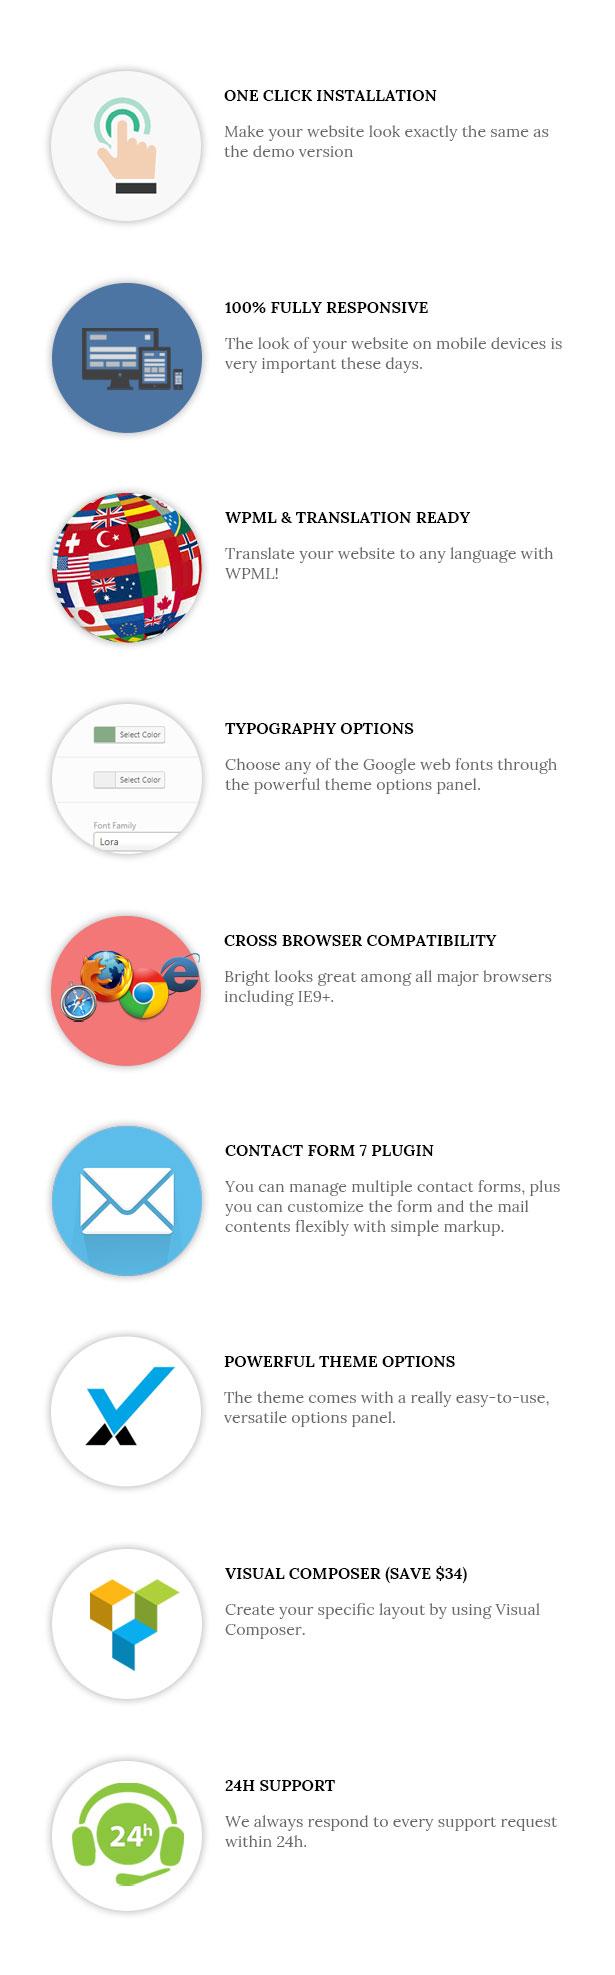 features-2.jpg